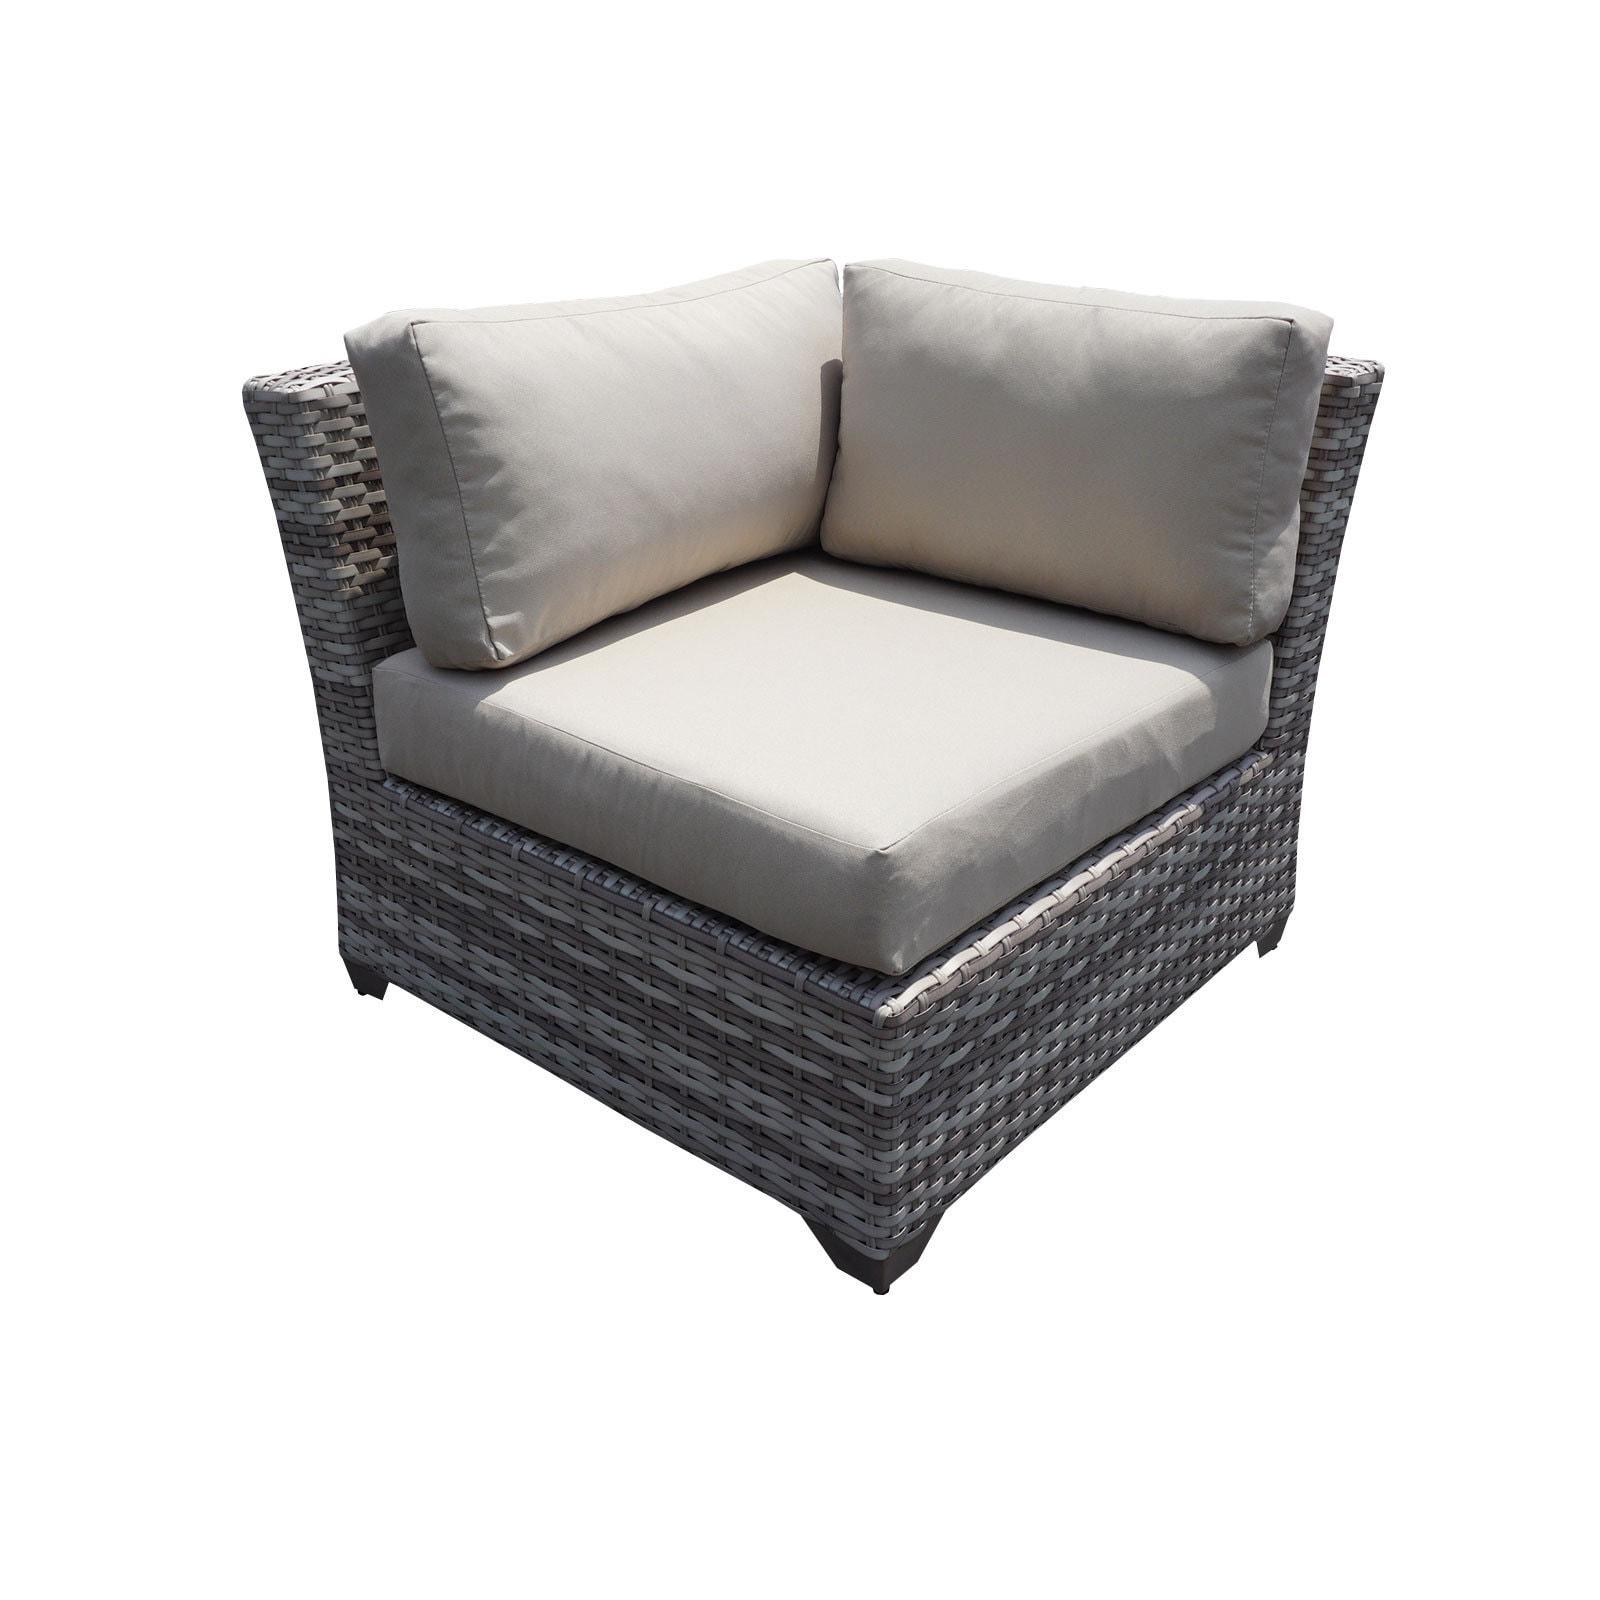 Fairmont 8 Piece Outdoor Wicker Patio Furniture Set 08d Free